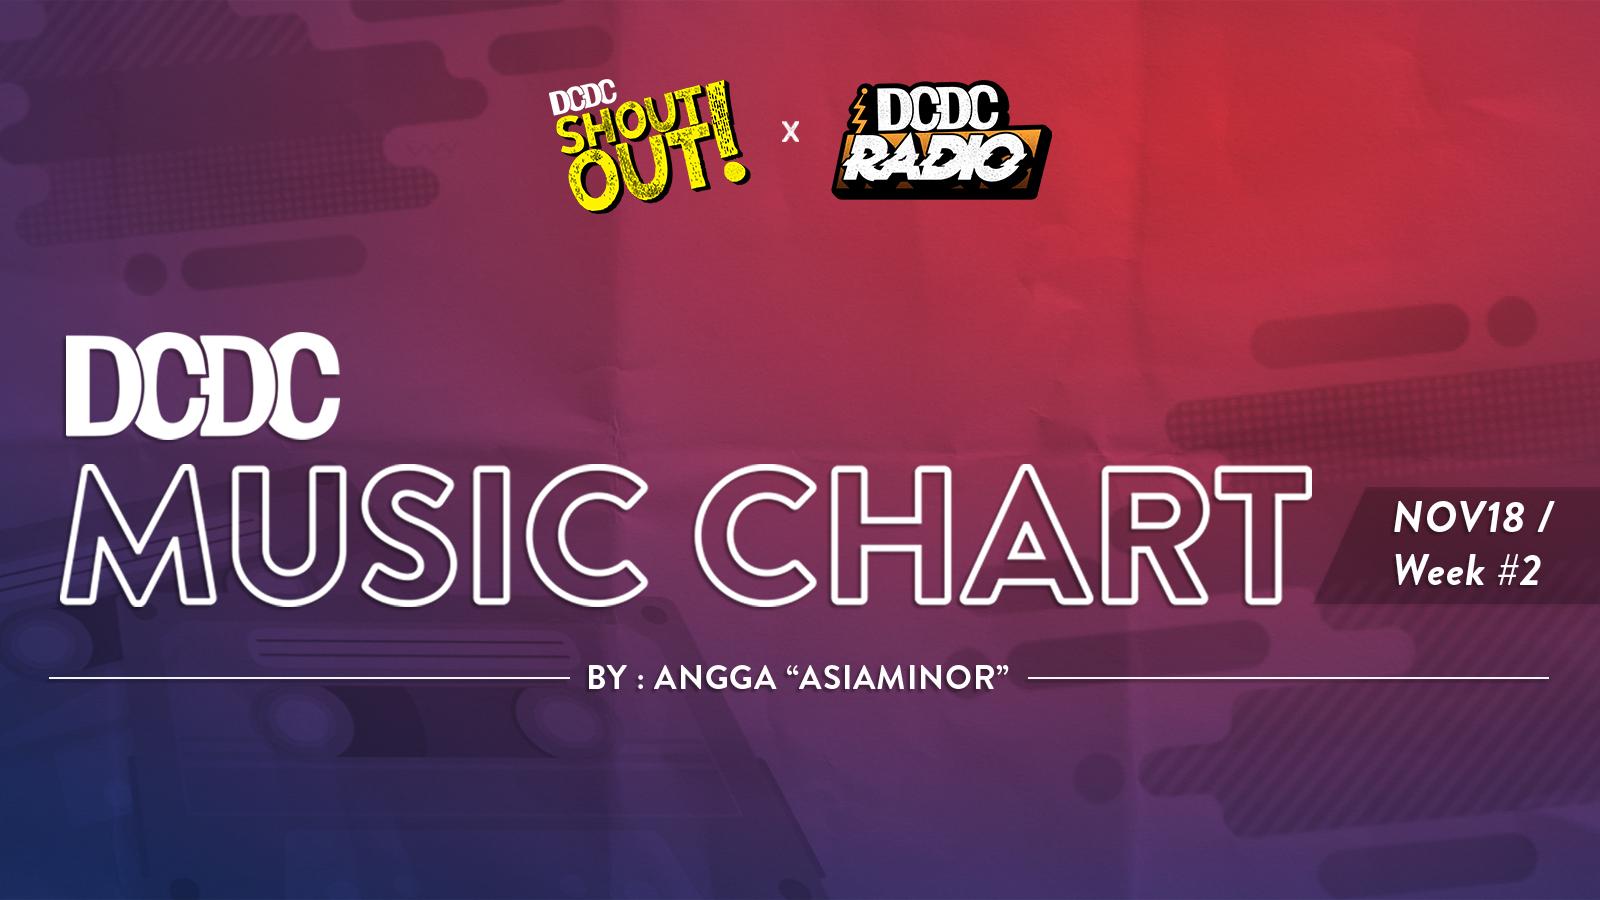 DCDC Music Chart - #2nd Week of November 2018